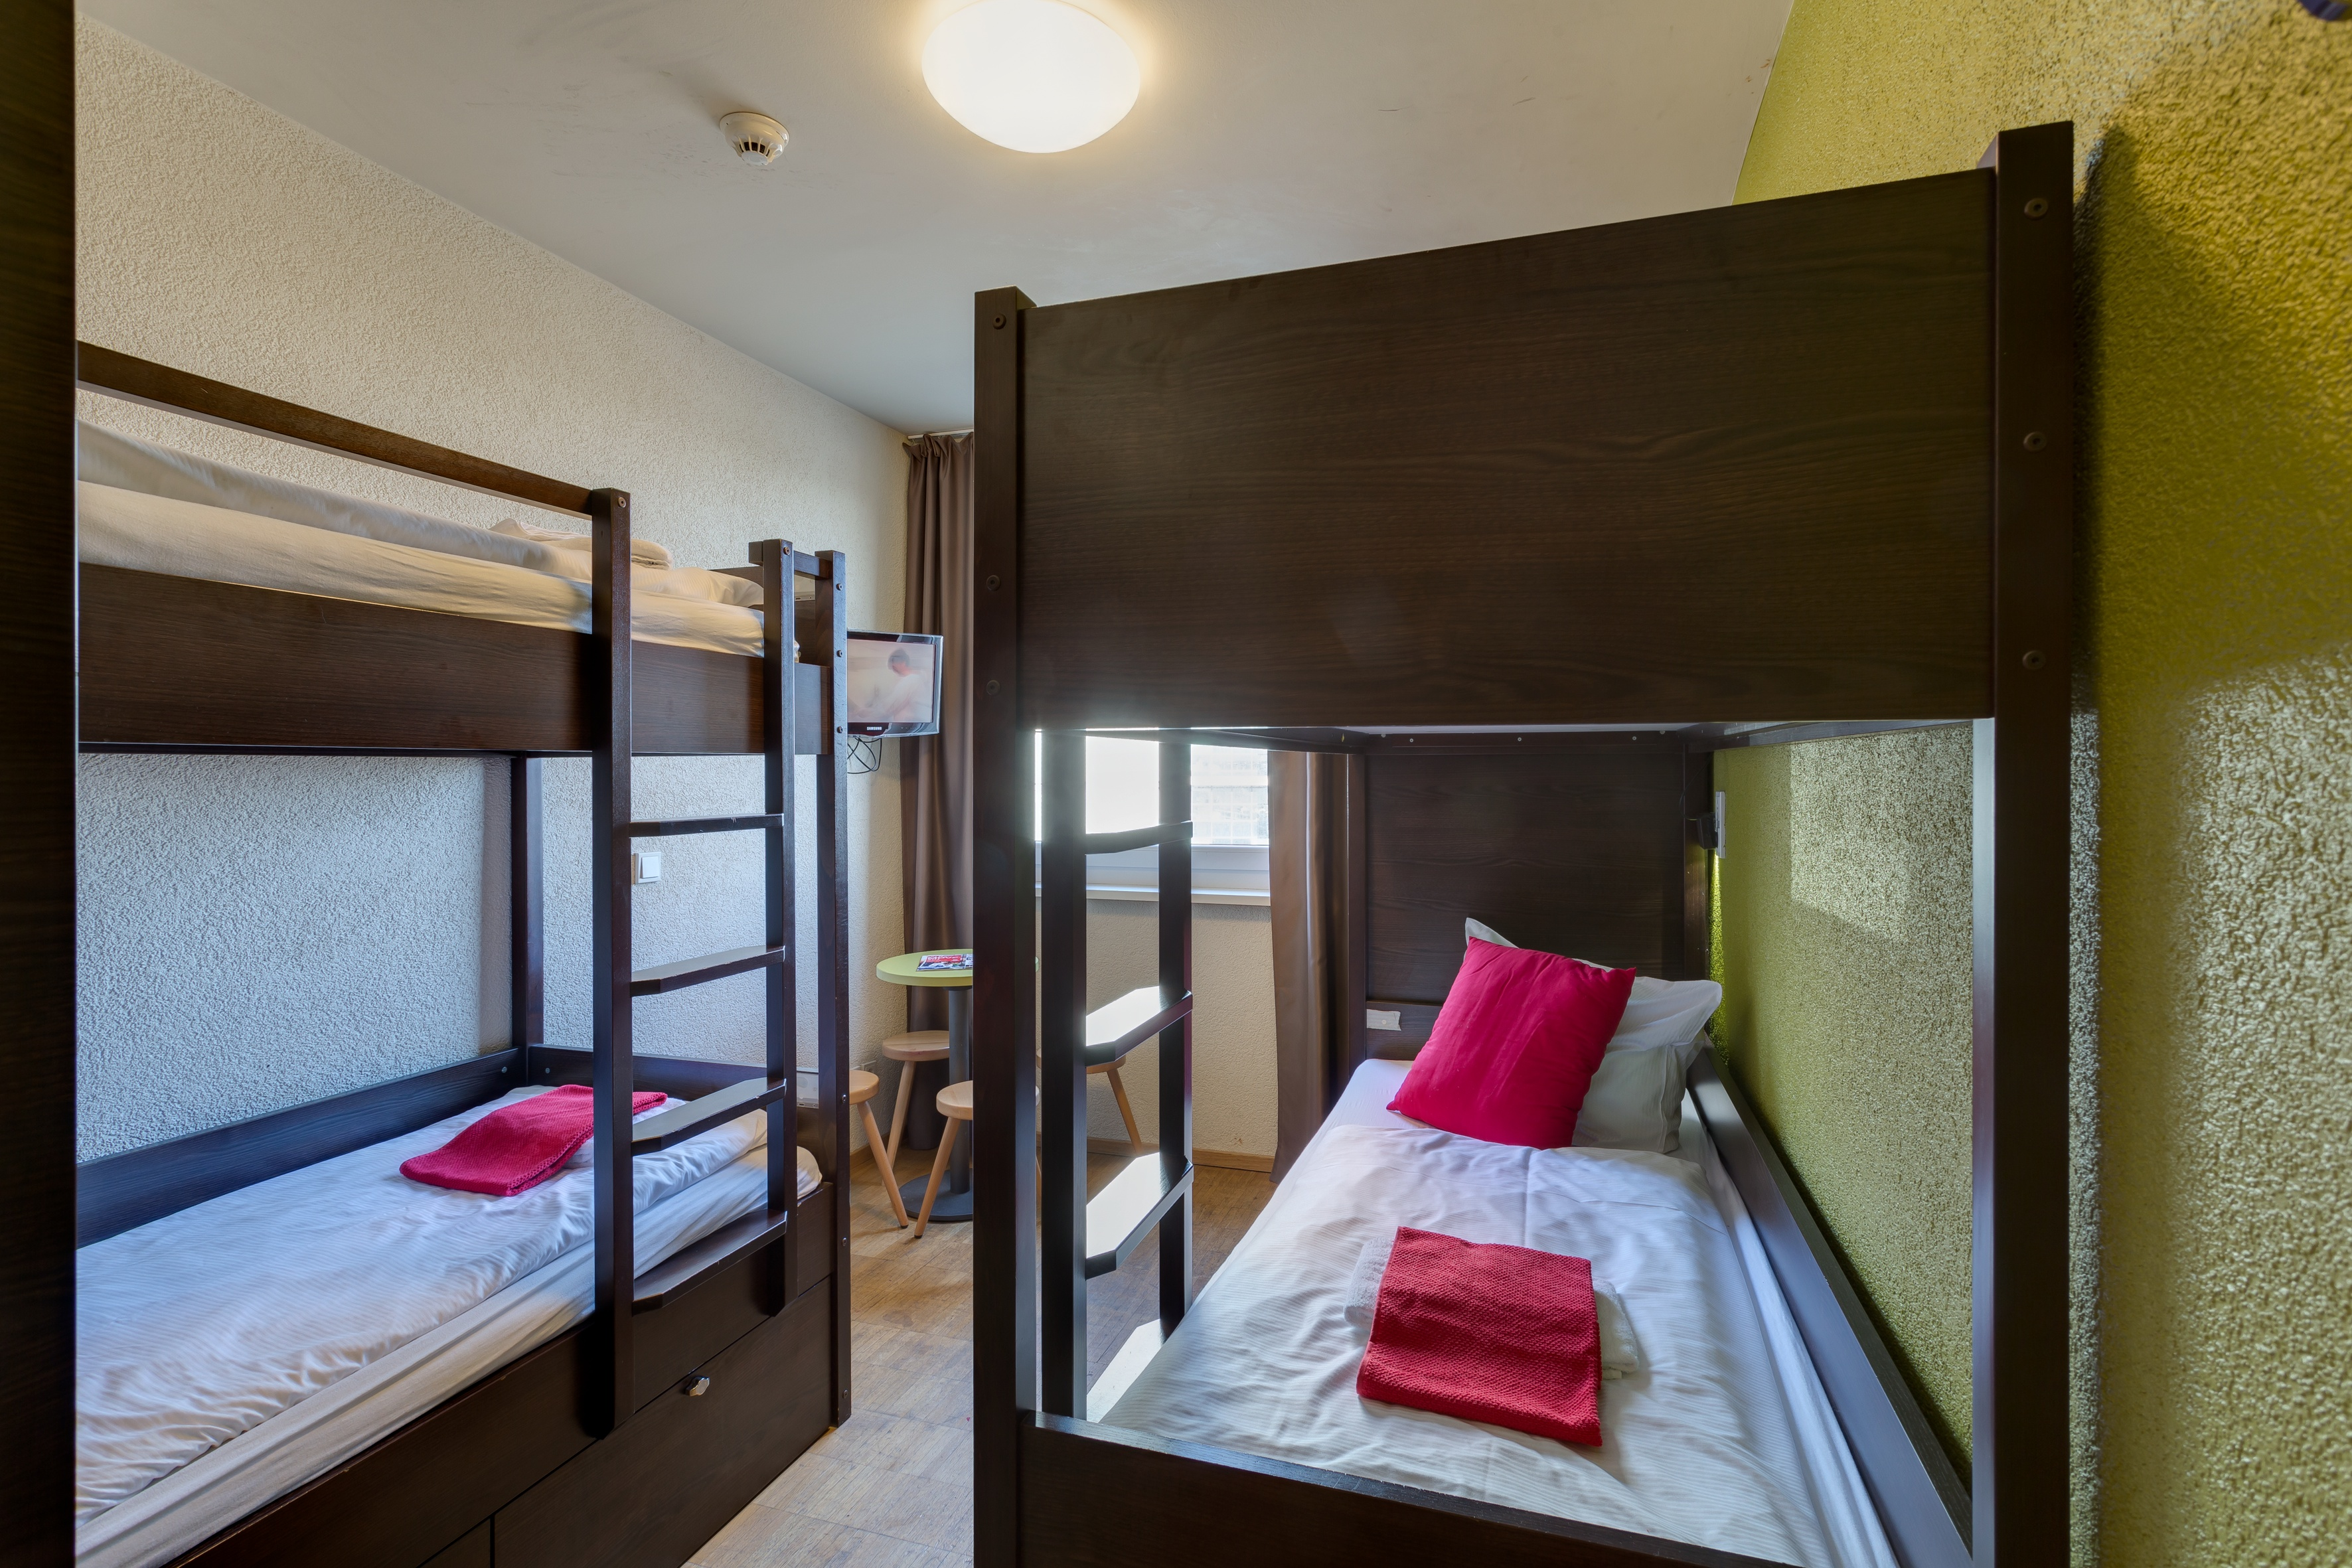 MEININGER Hotel Berlin Central Station - Dormitory